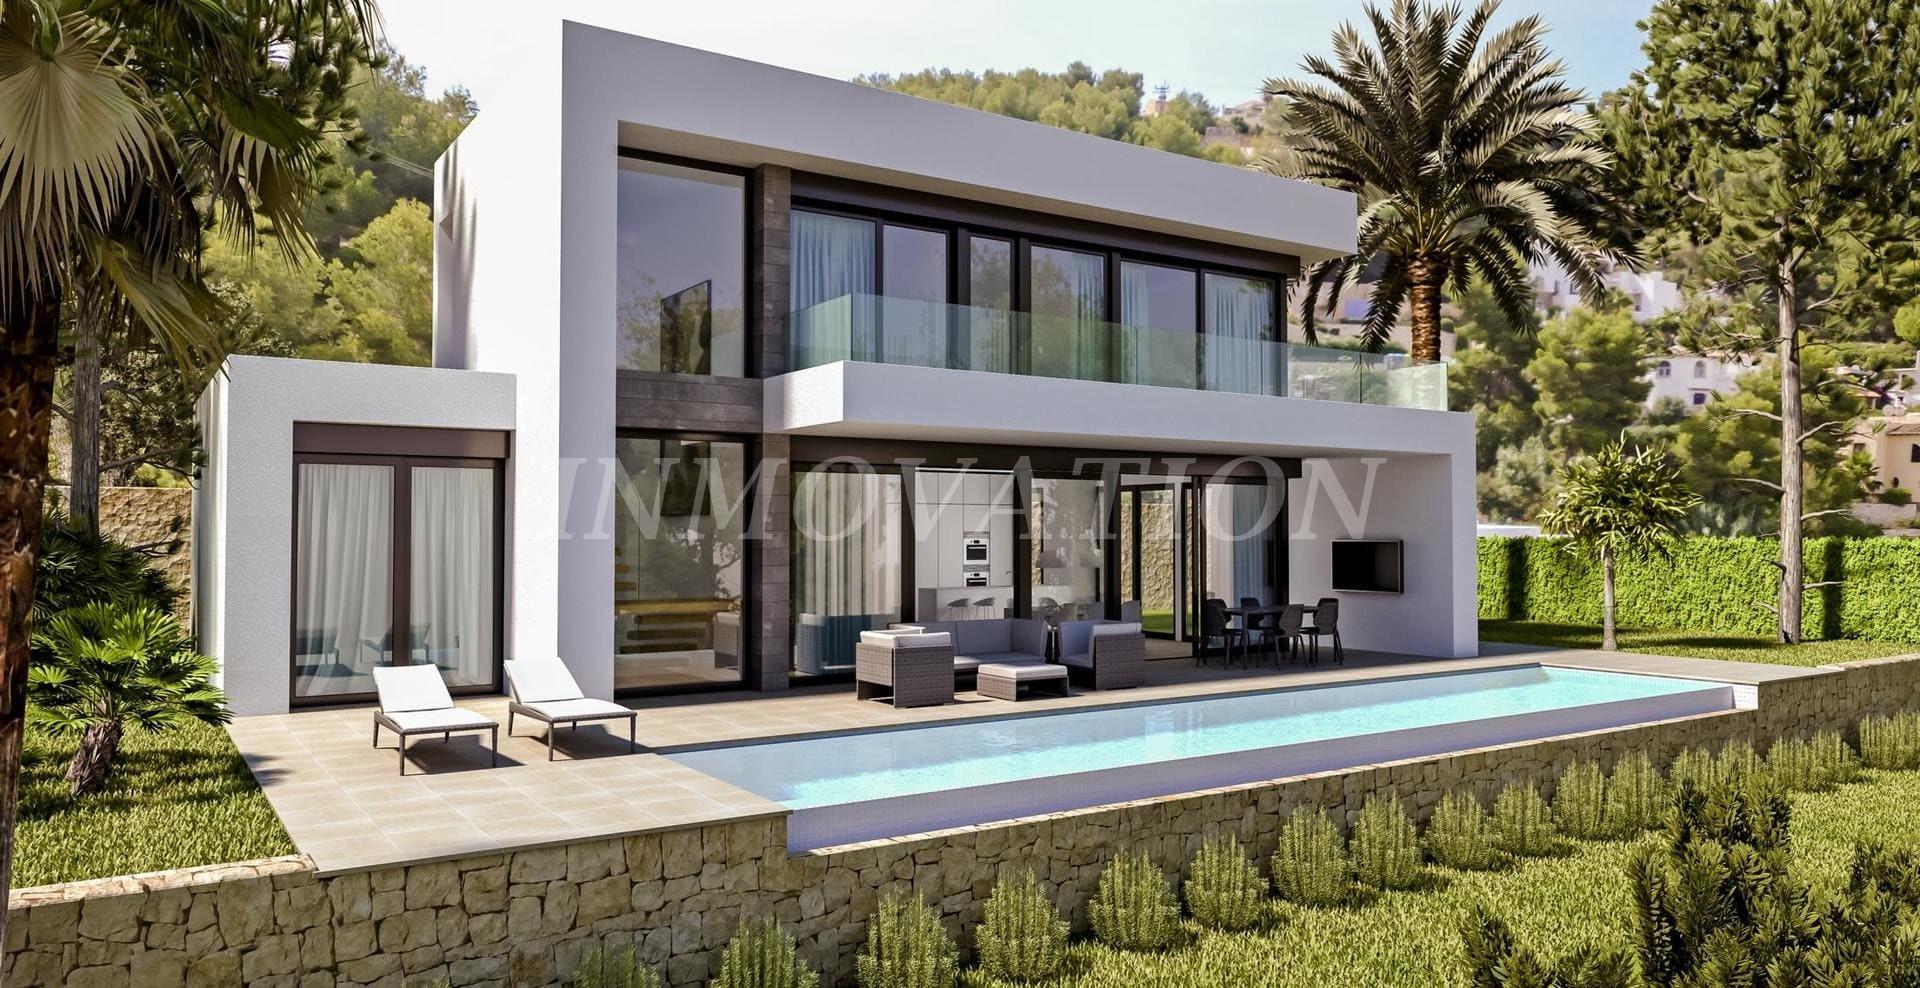 Modern Villa Design for Pedreguer